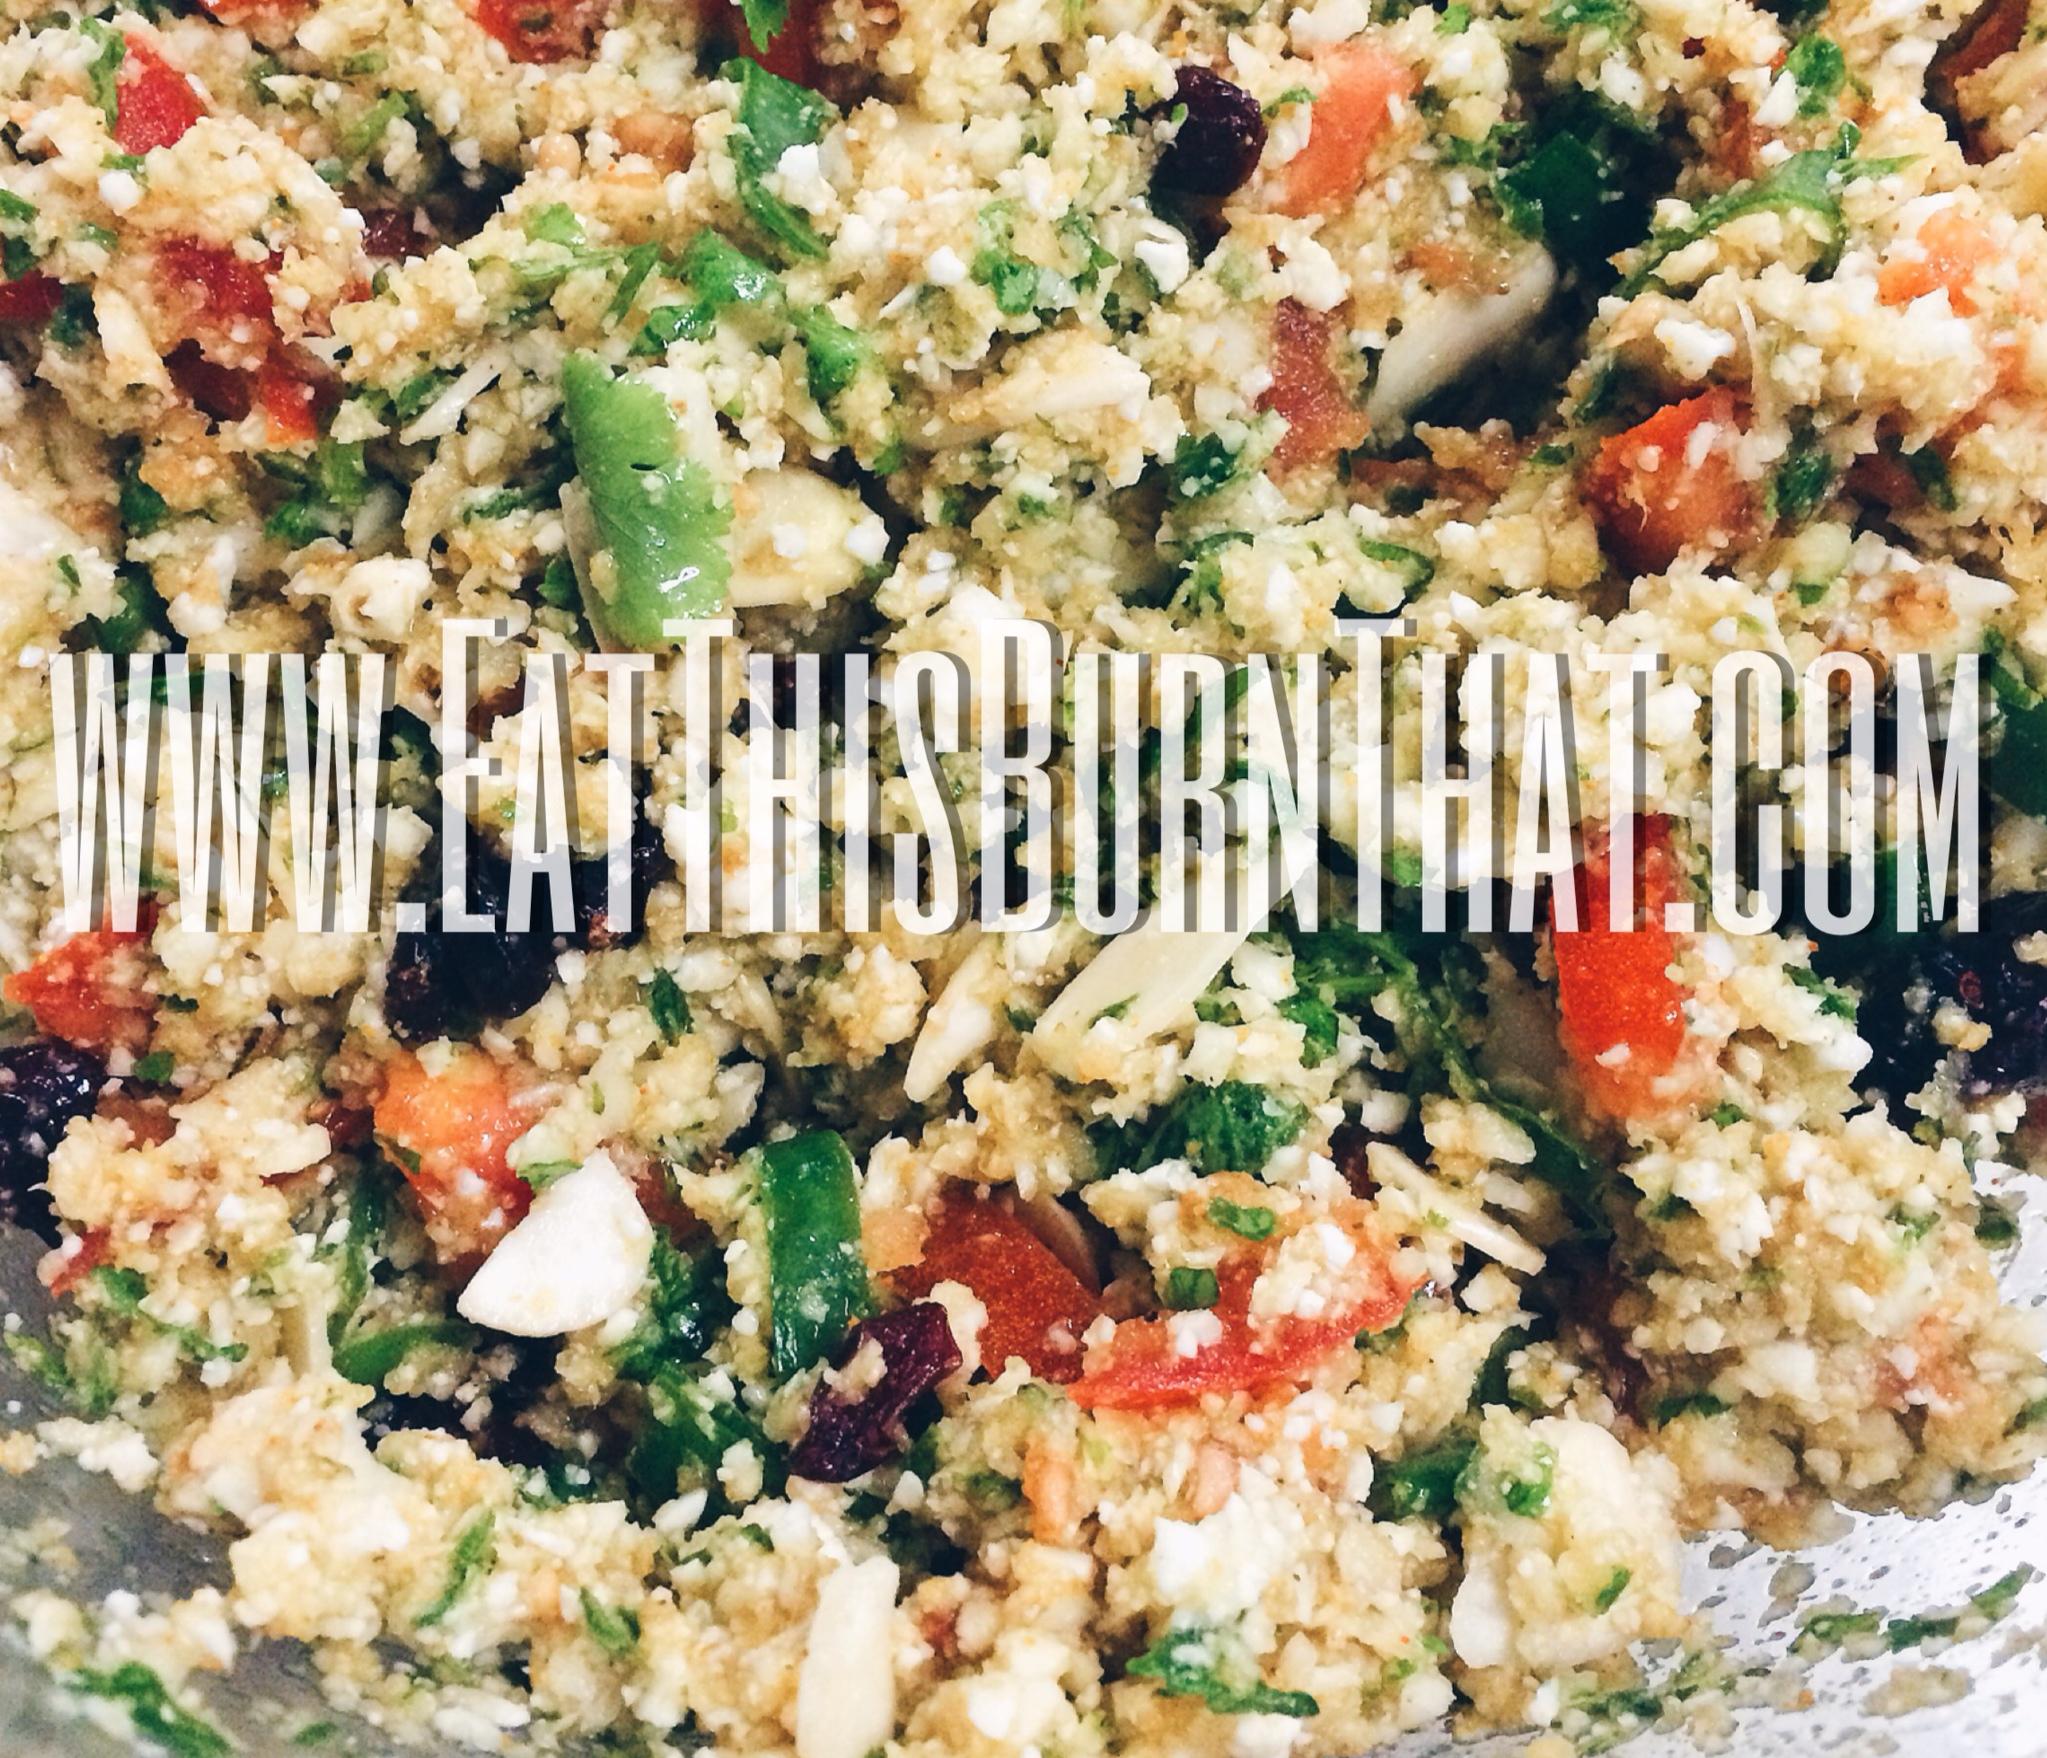 Spicy_Chopped_Salad2.jpg